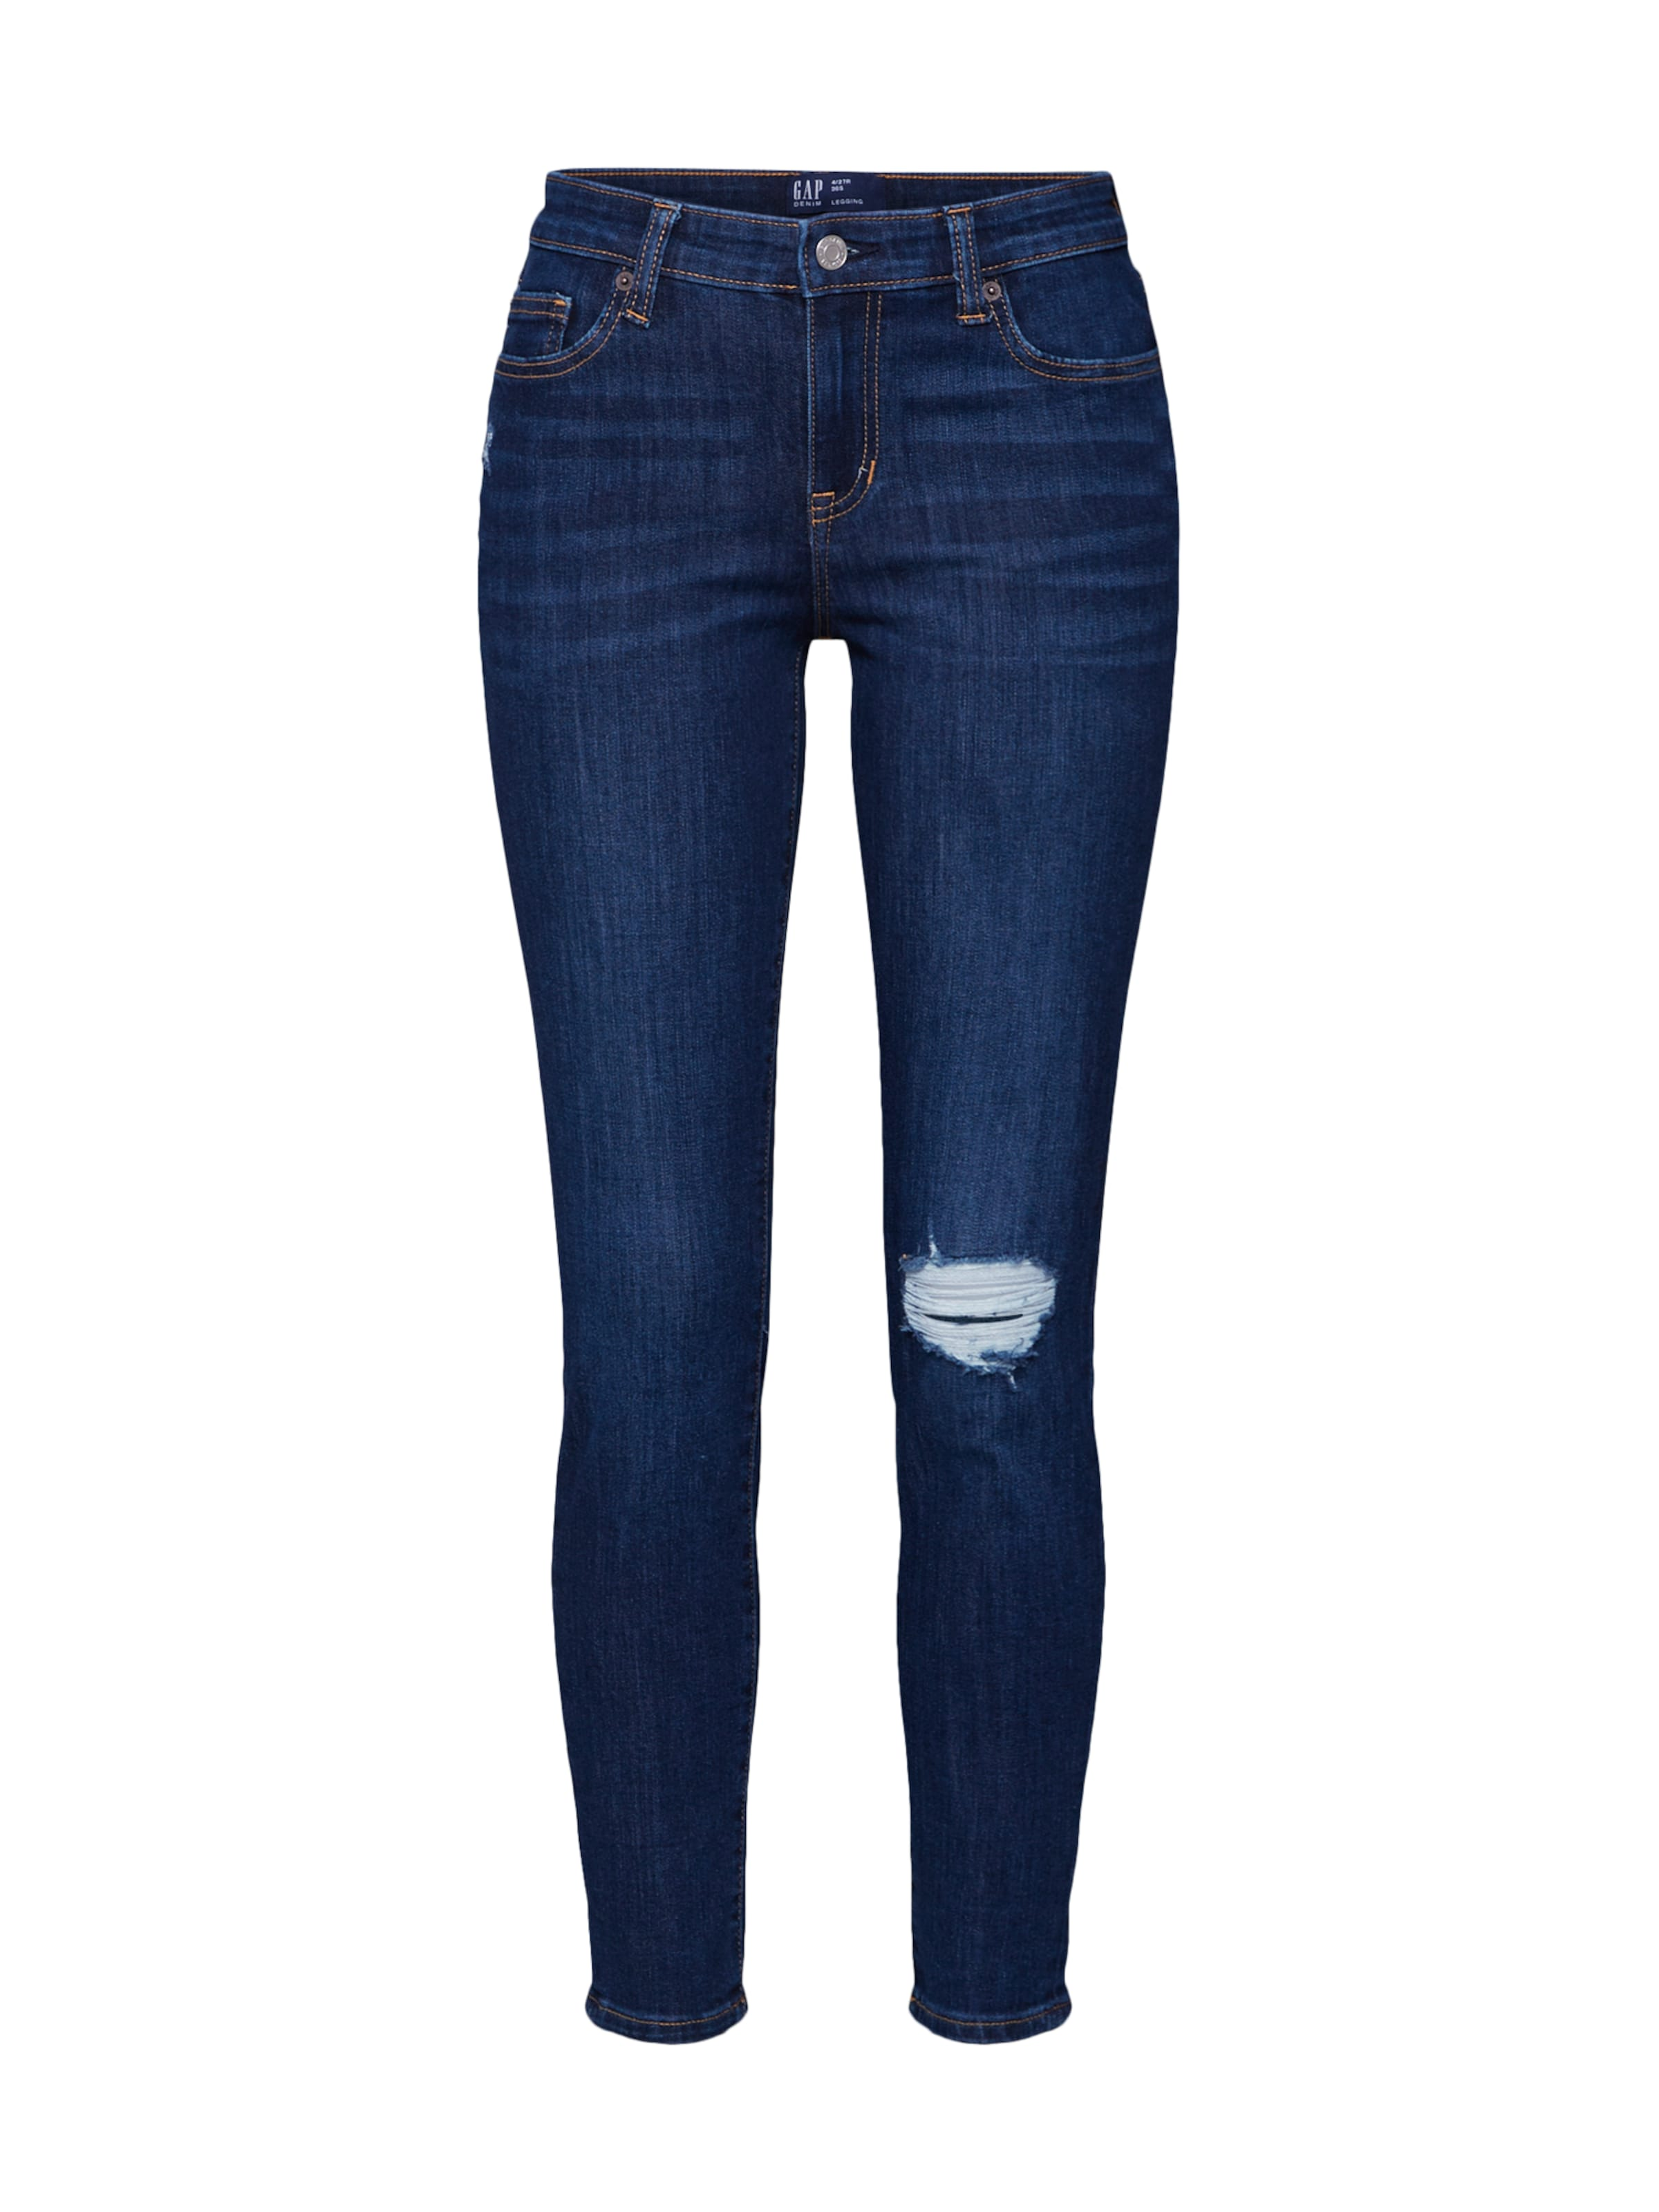 Dk In Kristin 'v Gap Jeans legging Dest' Indigo f76gyYvb